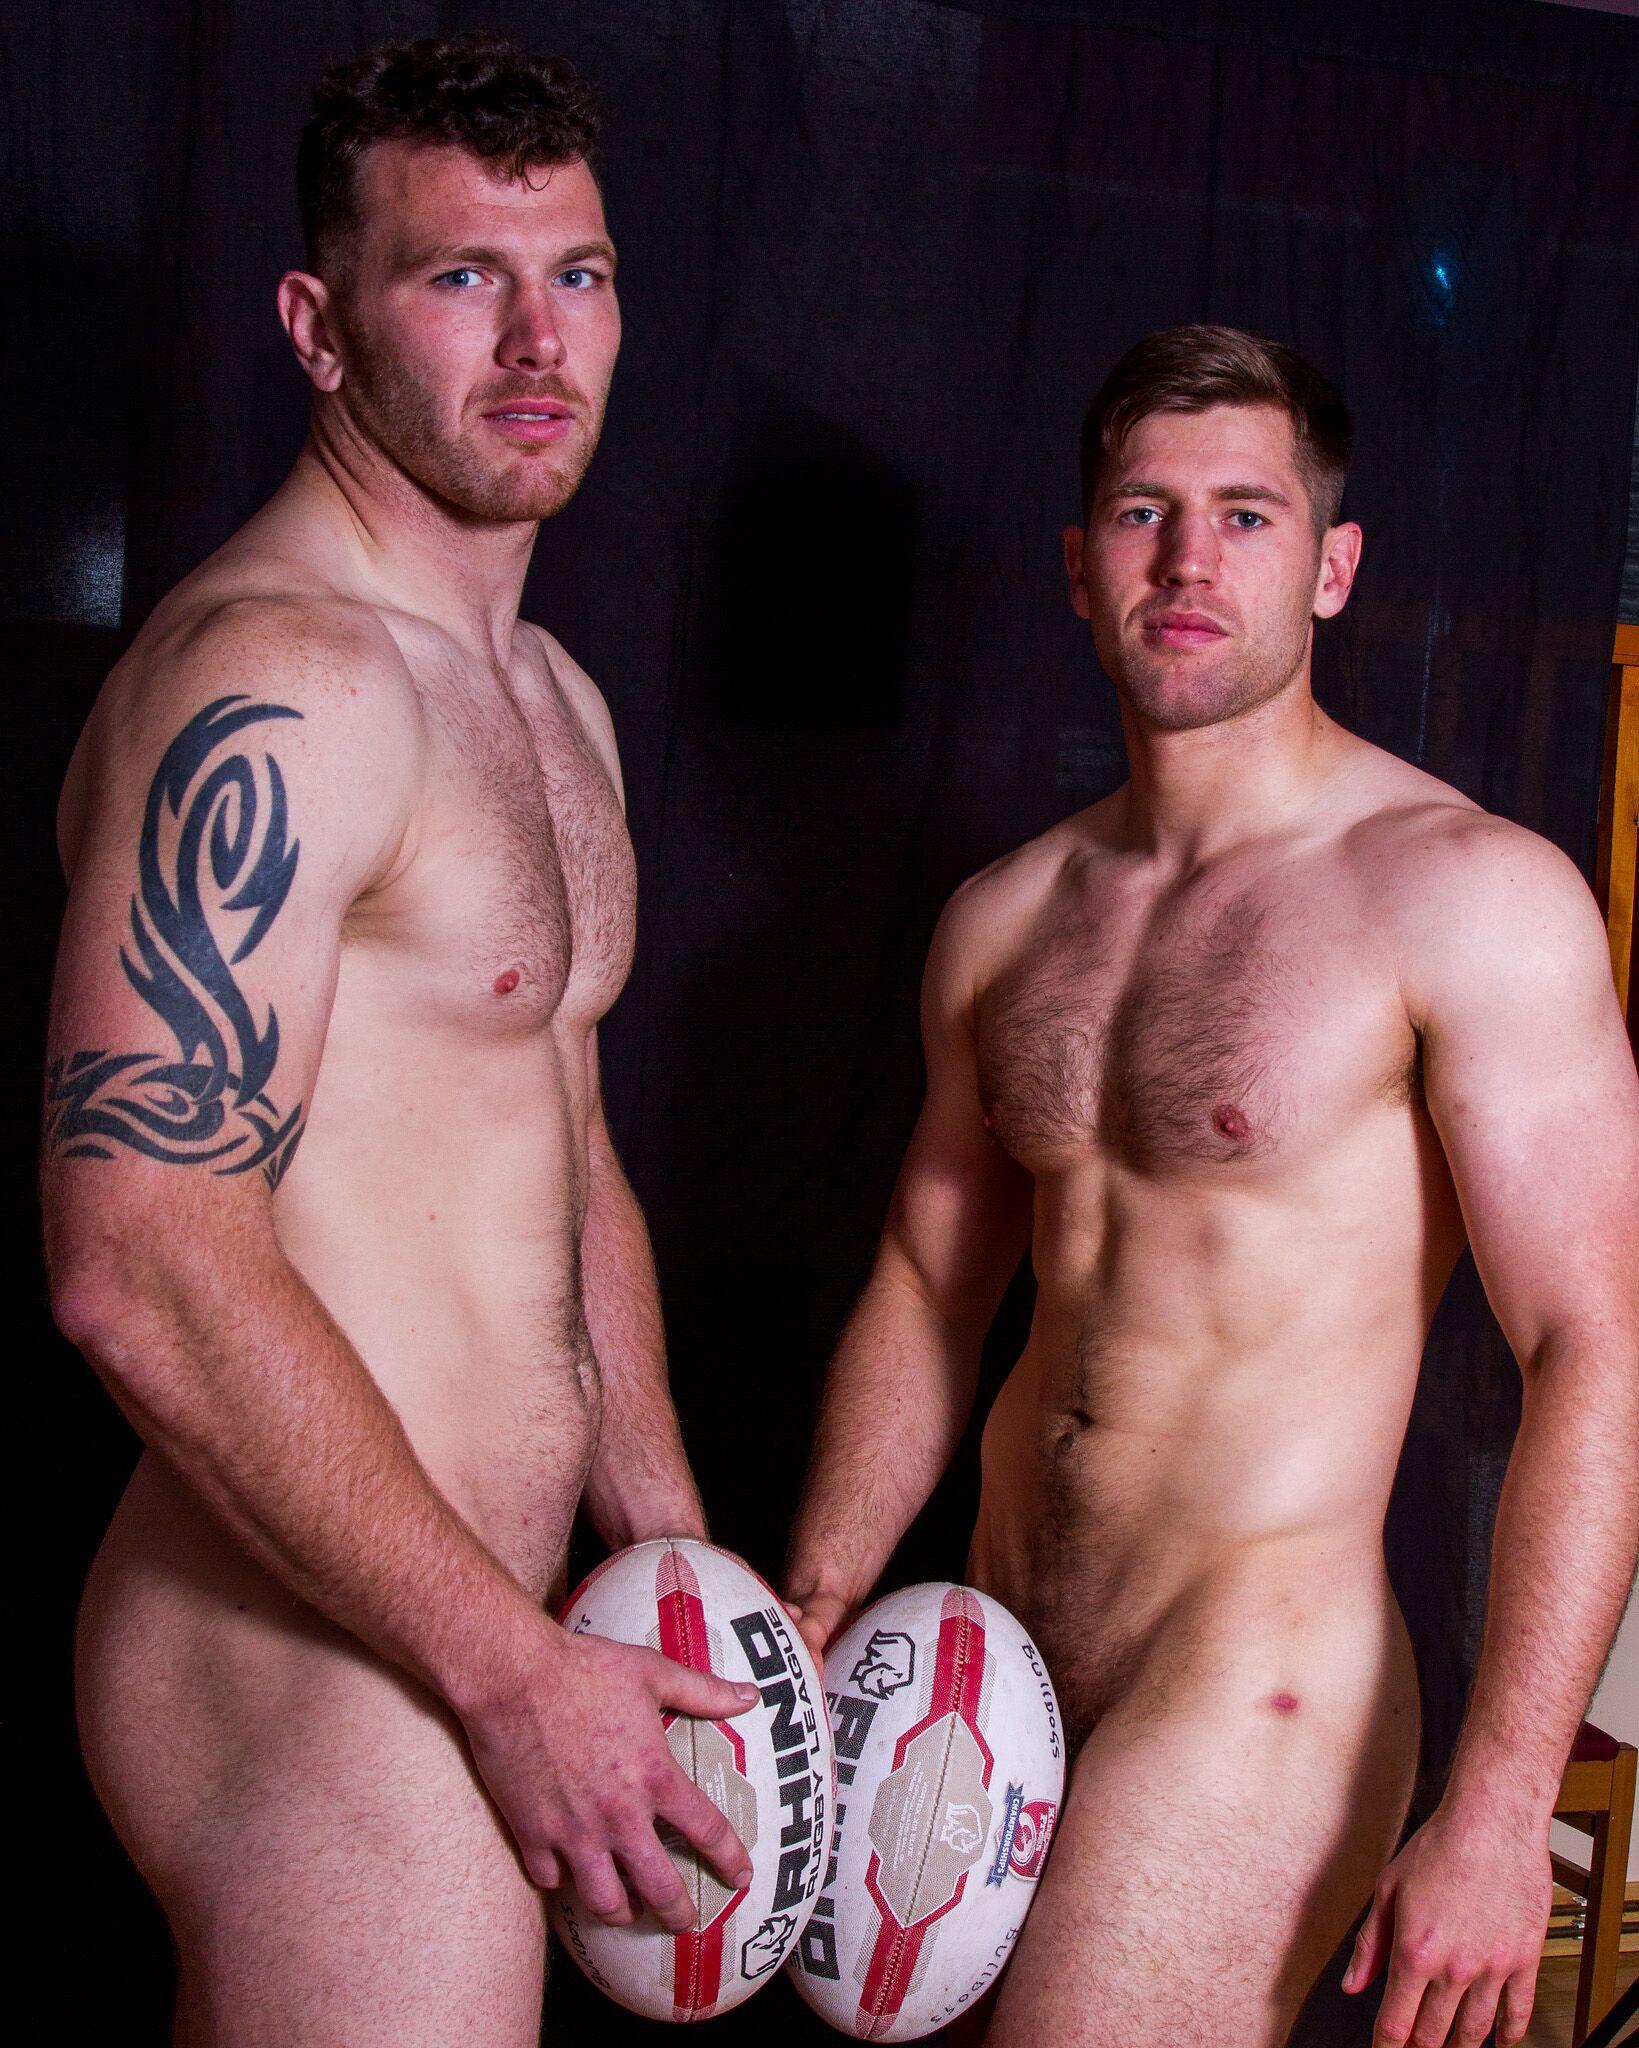 Nude Male Handball 69